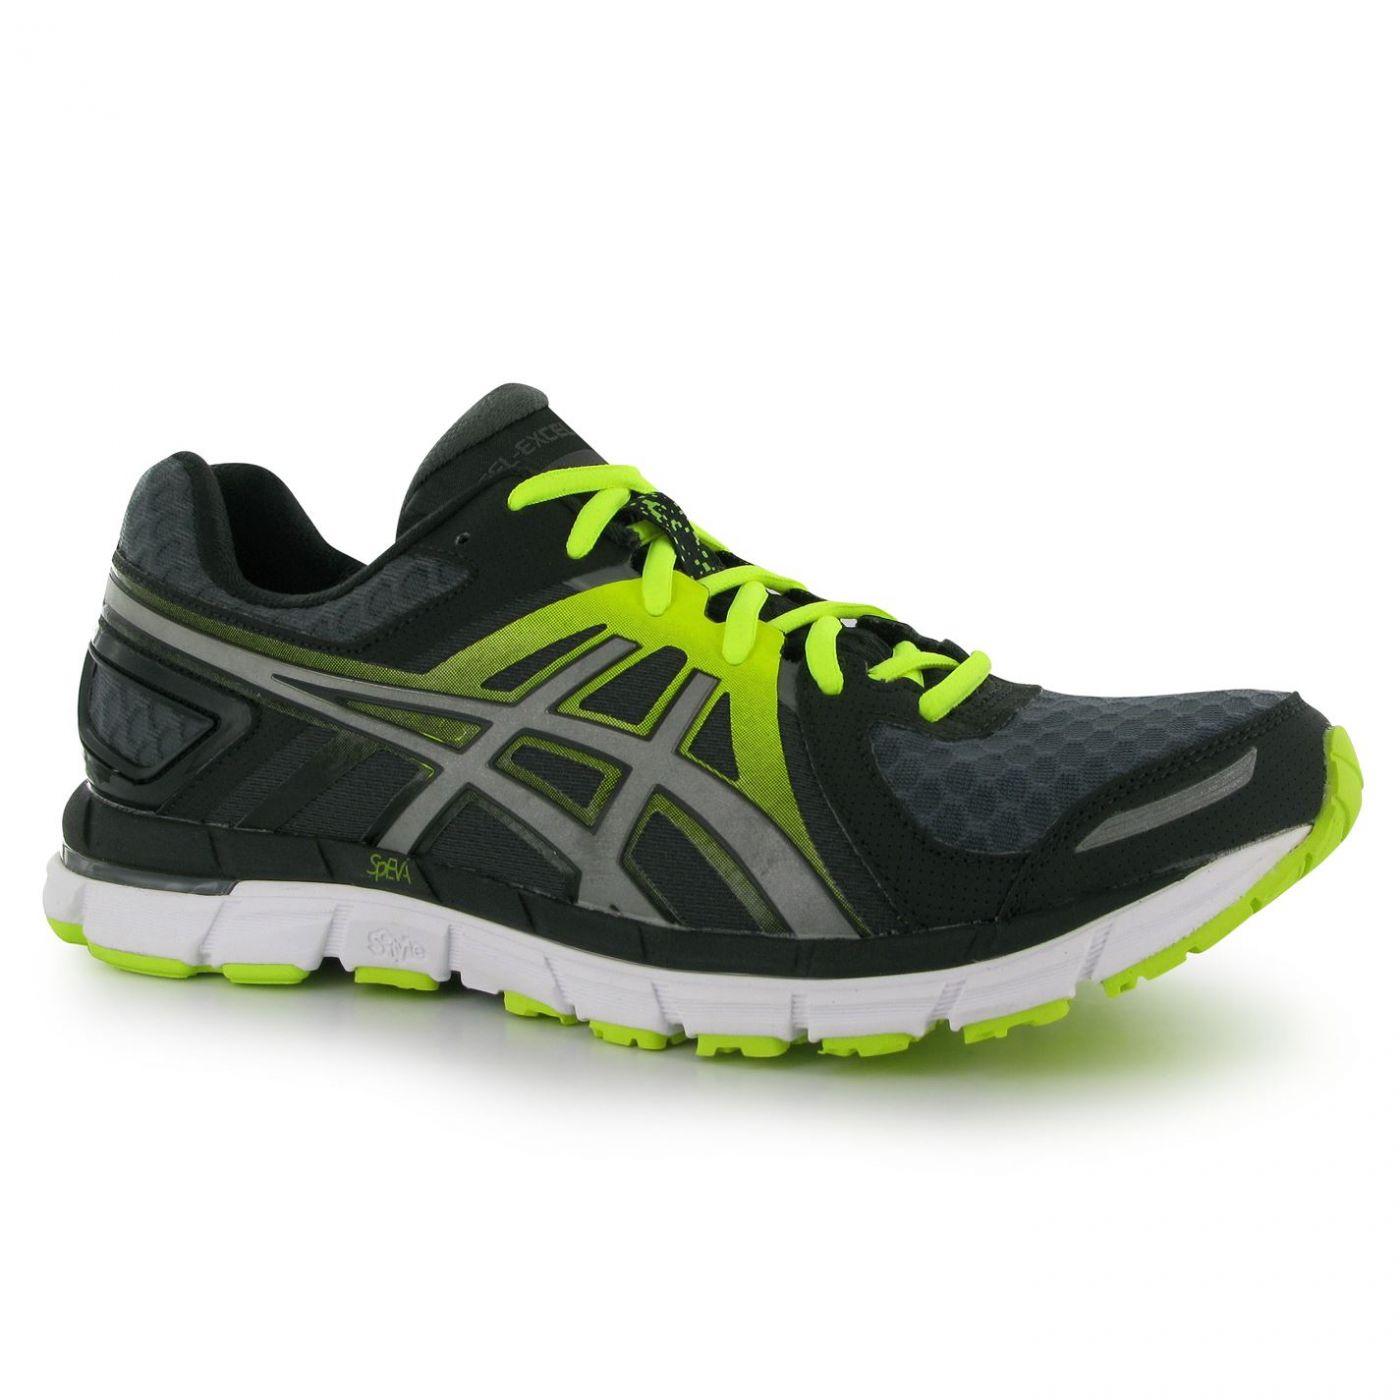 Asics Gel Excel 33 v2 Mens Running Shoes